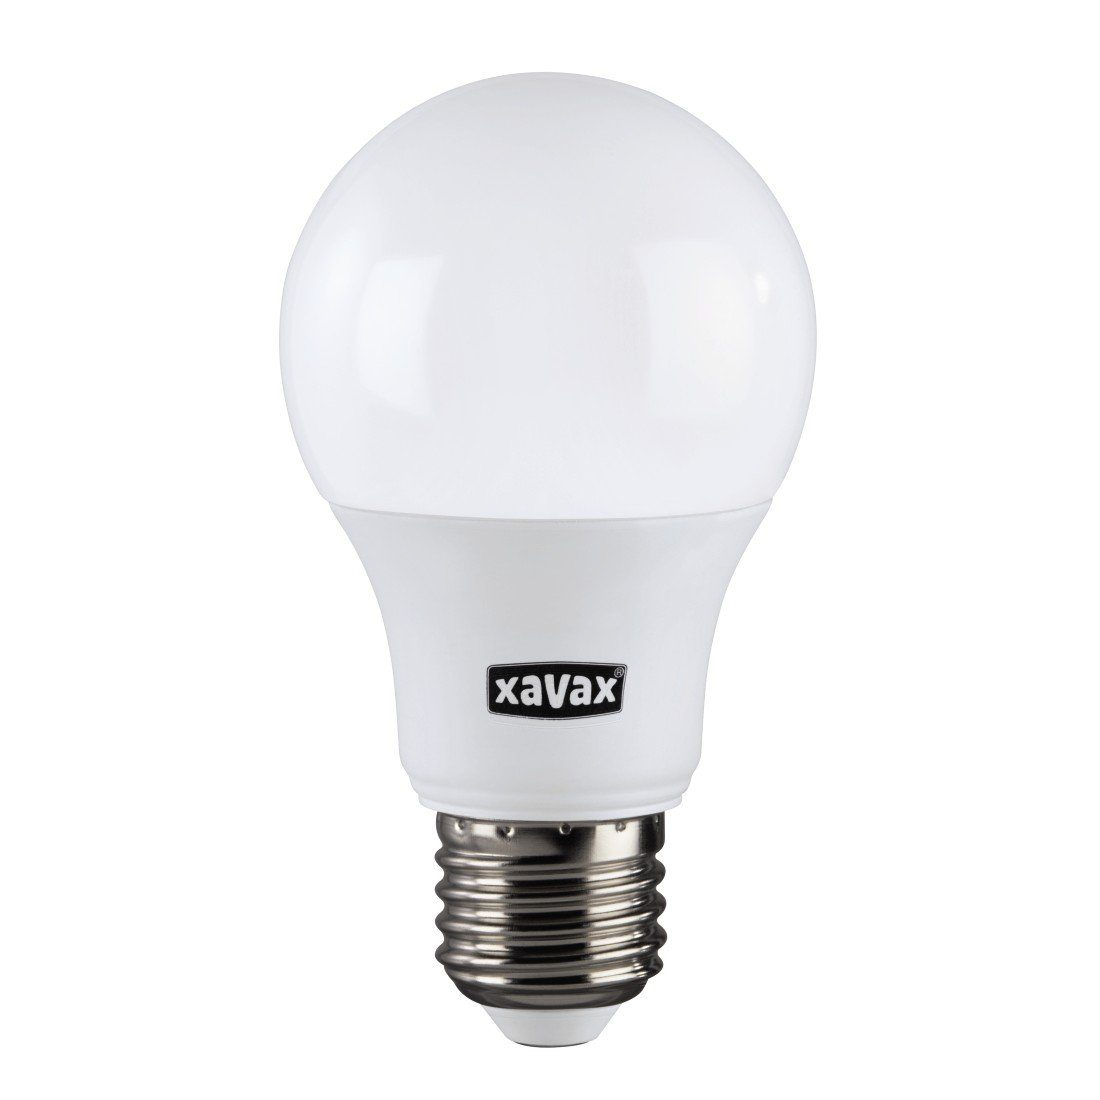 Xavax LED-Lampe, E27, 470lm ersetzt 40W Glühlampe, Warmweiß, RA90